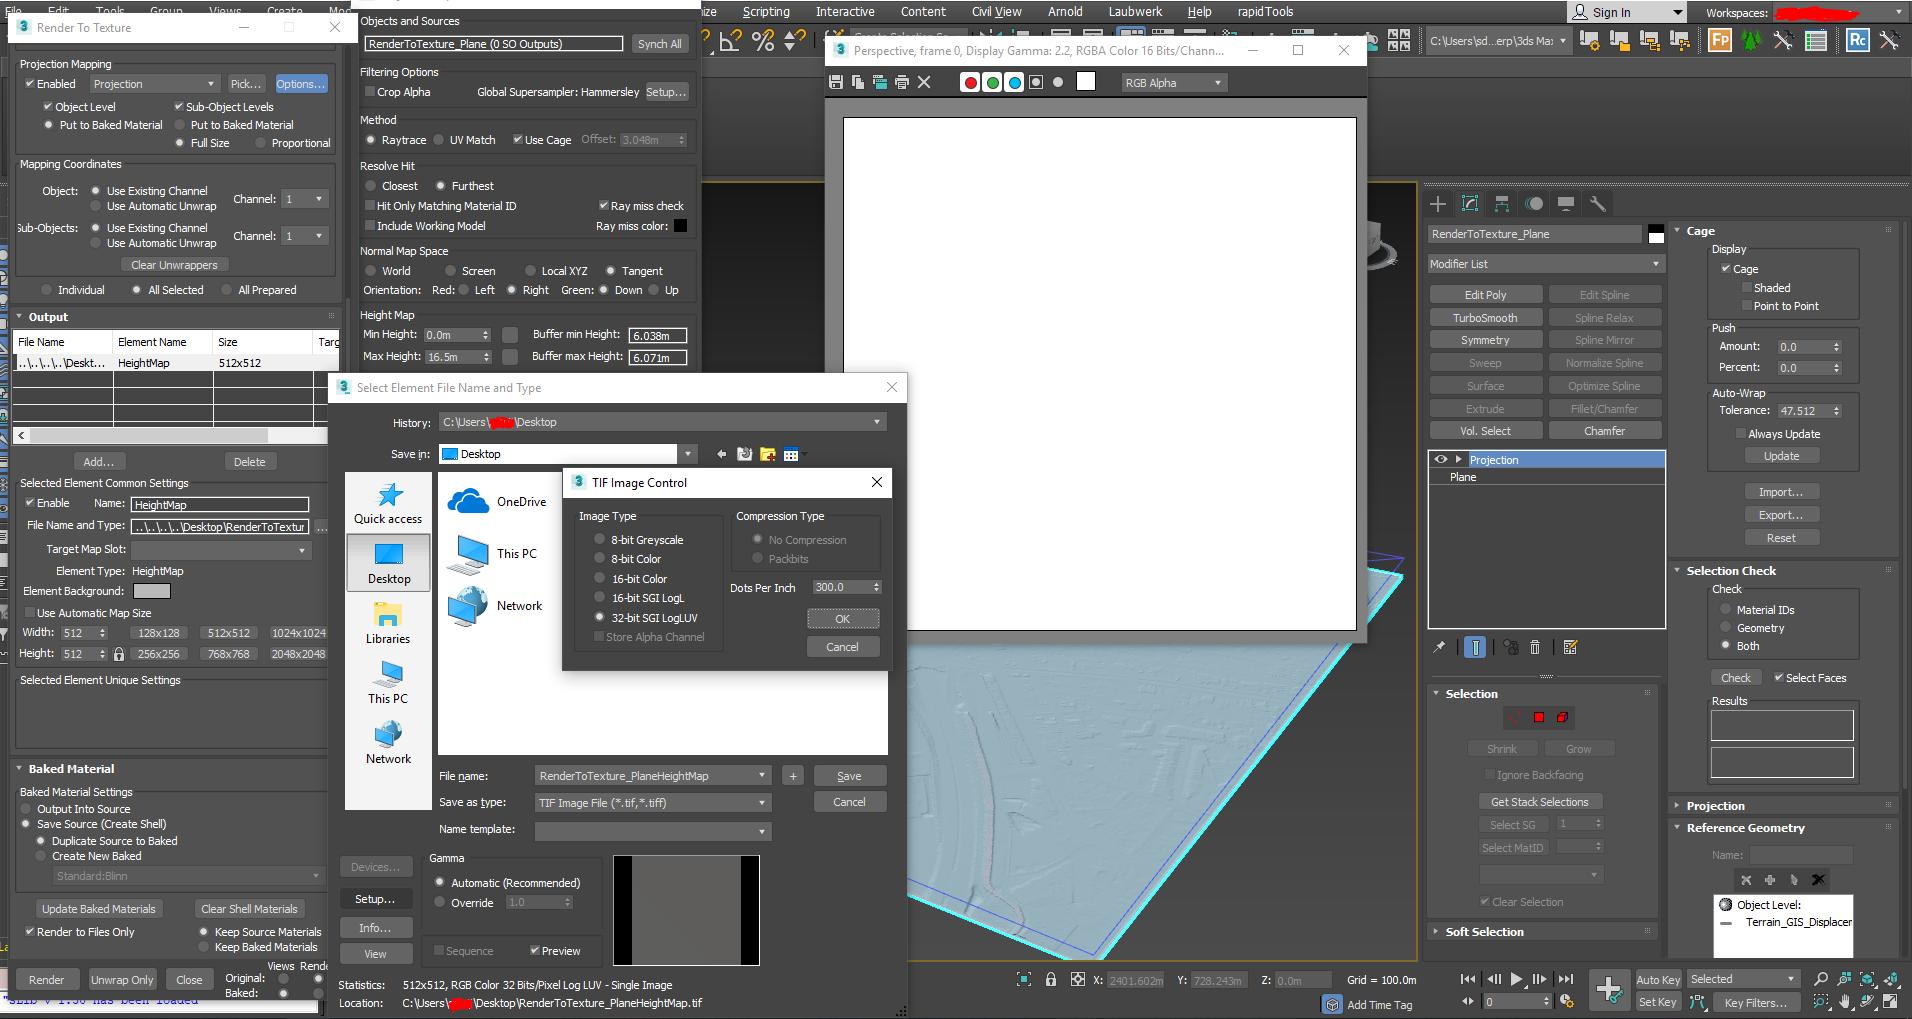 Solved: Render to texture - Heightmap: grey texture